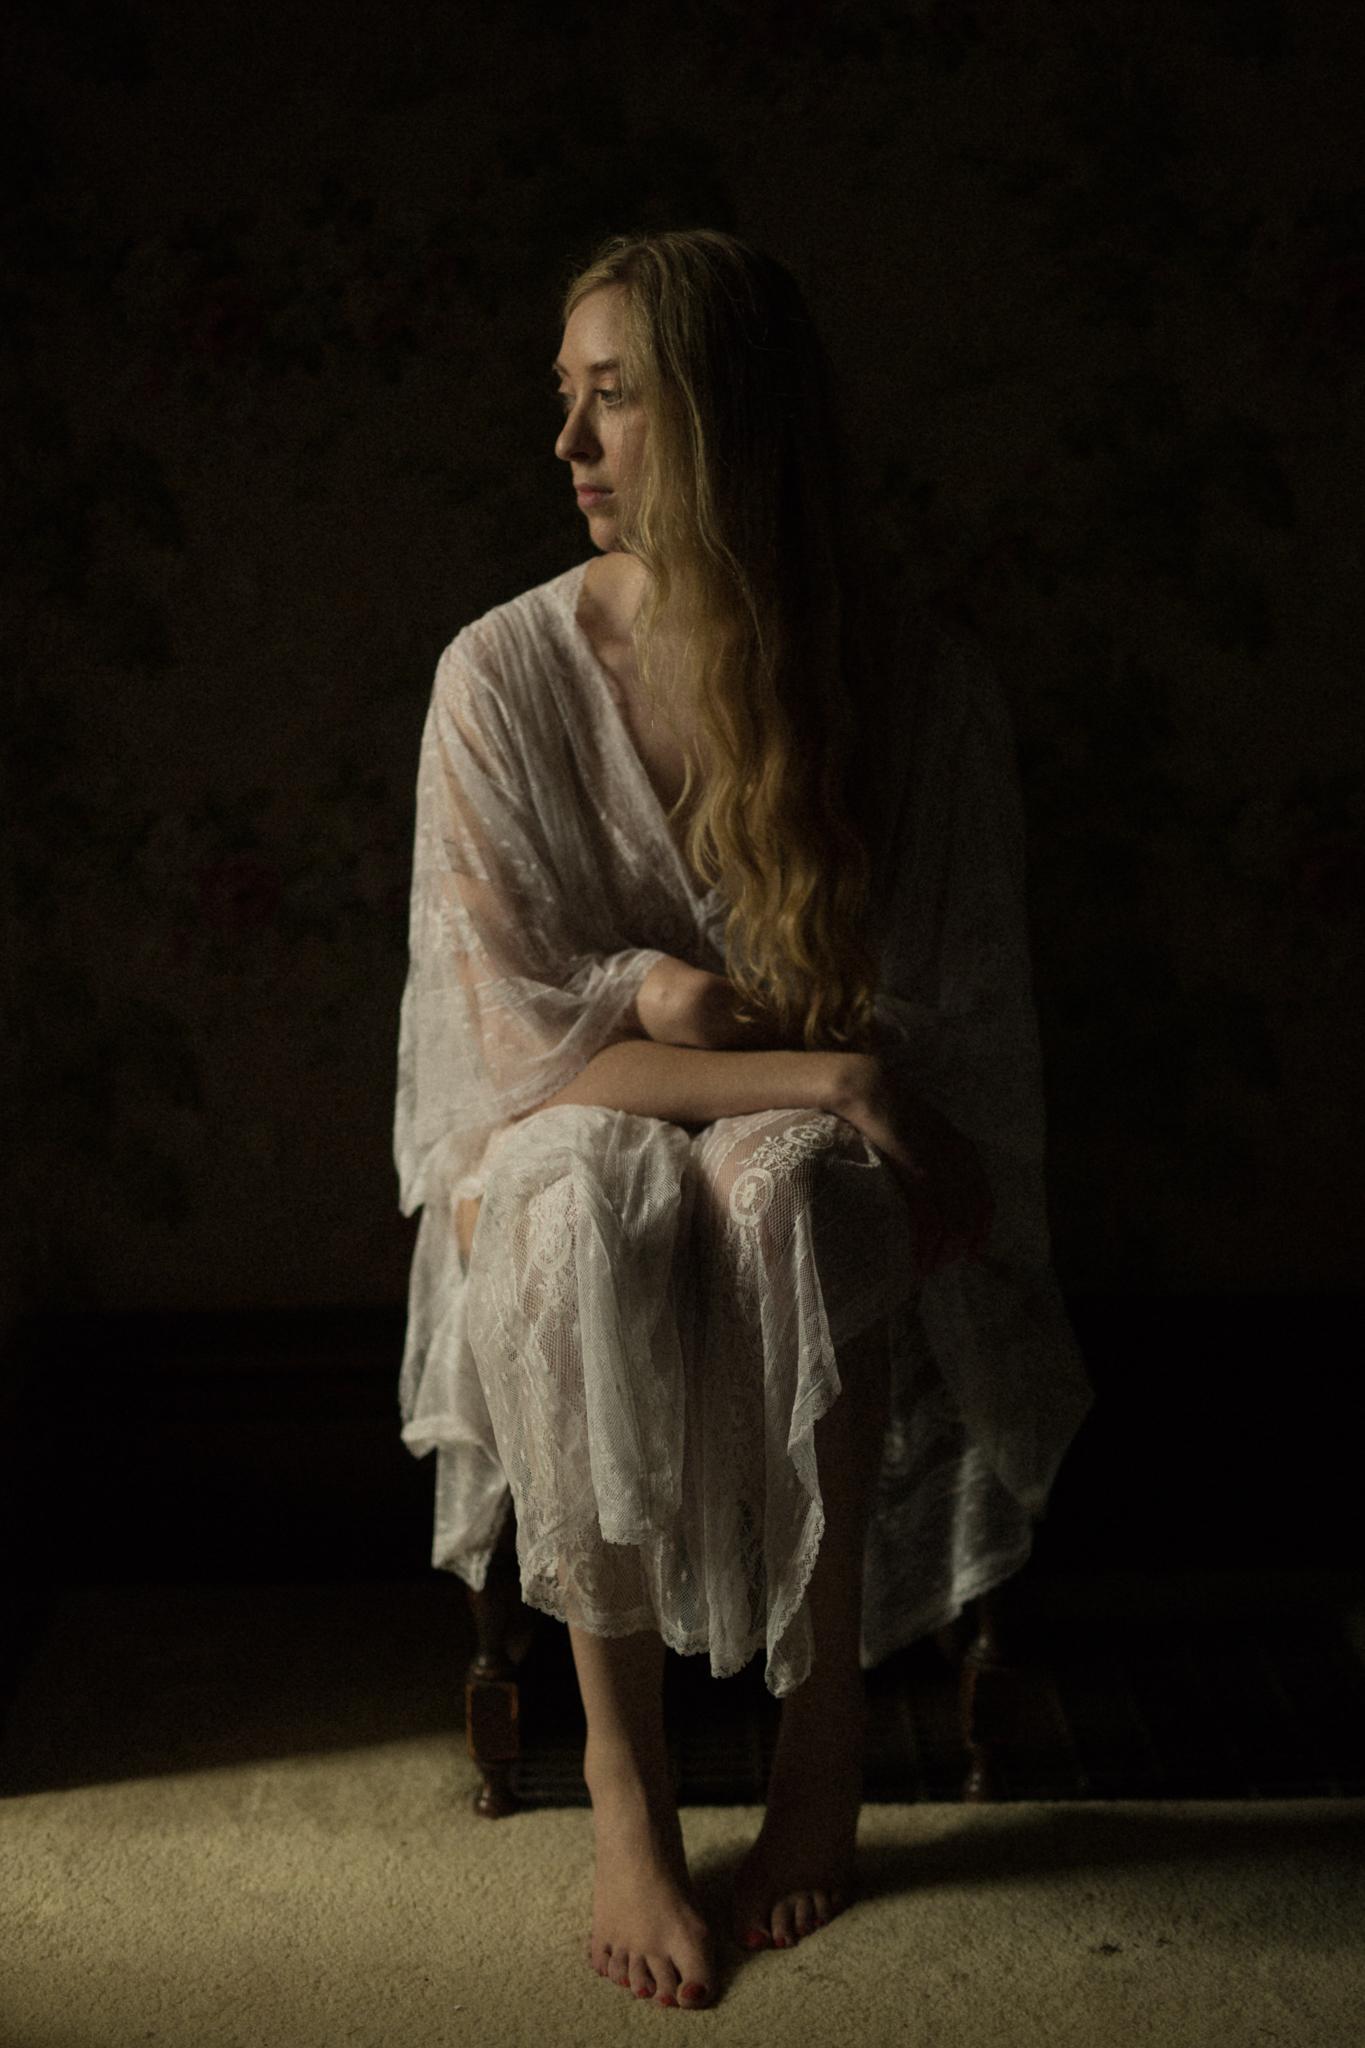 Renaissance painting inspiration bohemian victorian chiaroscuro portrait light classic portraiture Columbus Ohio sarah rose photography